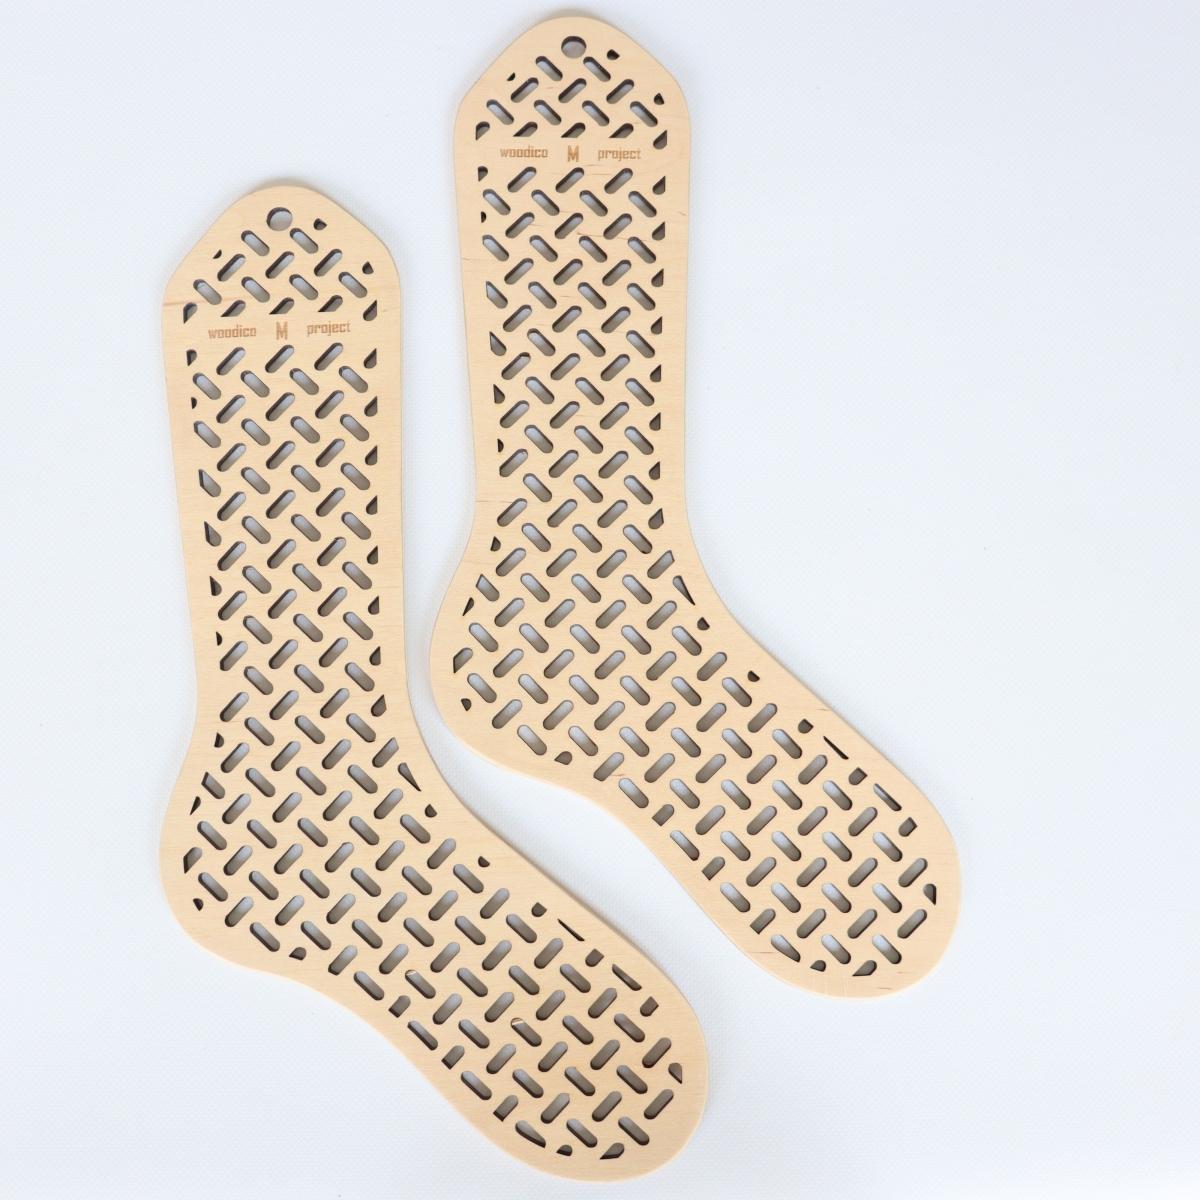 woodico.pro wooden sock blockers stitches 5 1200x1200 - Wooden sock blockers / Stitches